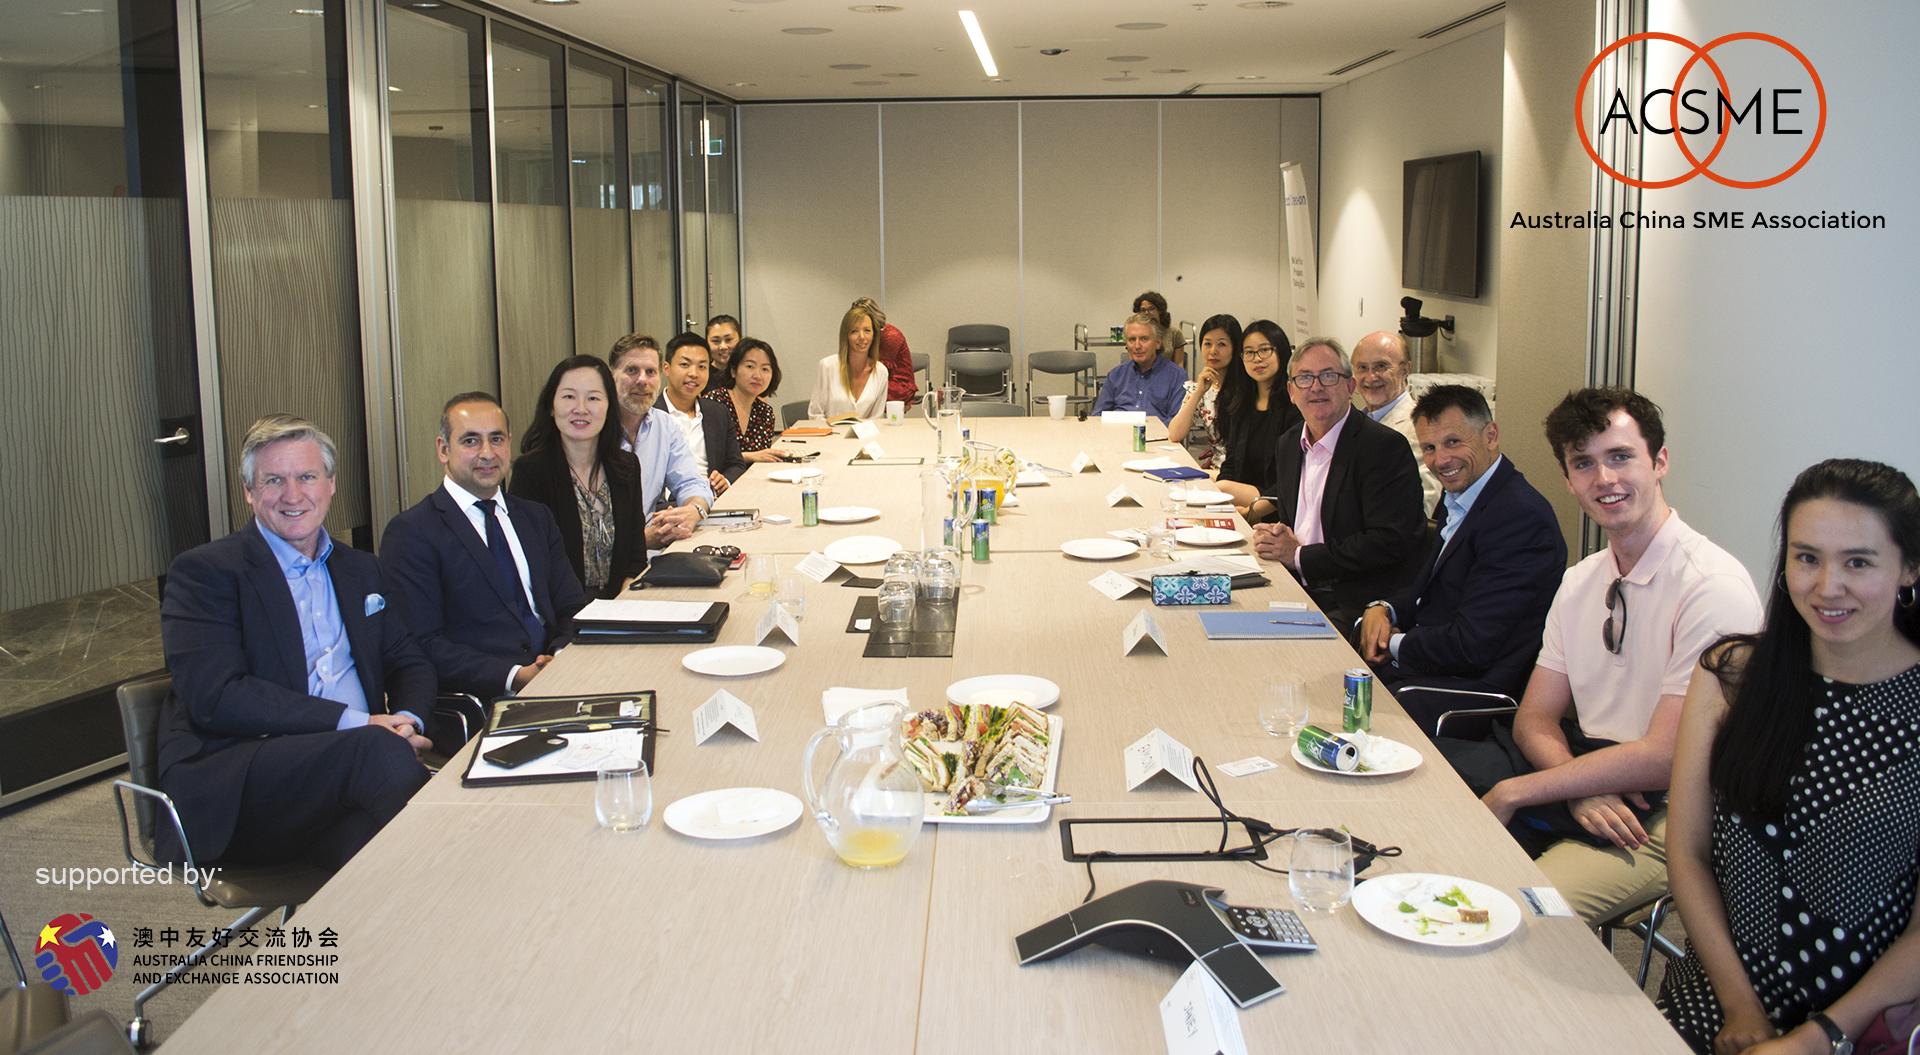 ACSME Group Photo -Feb-19.jpg